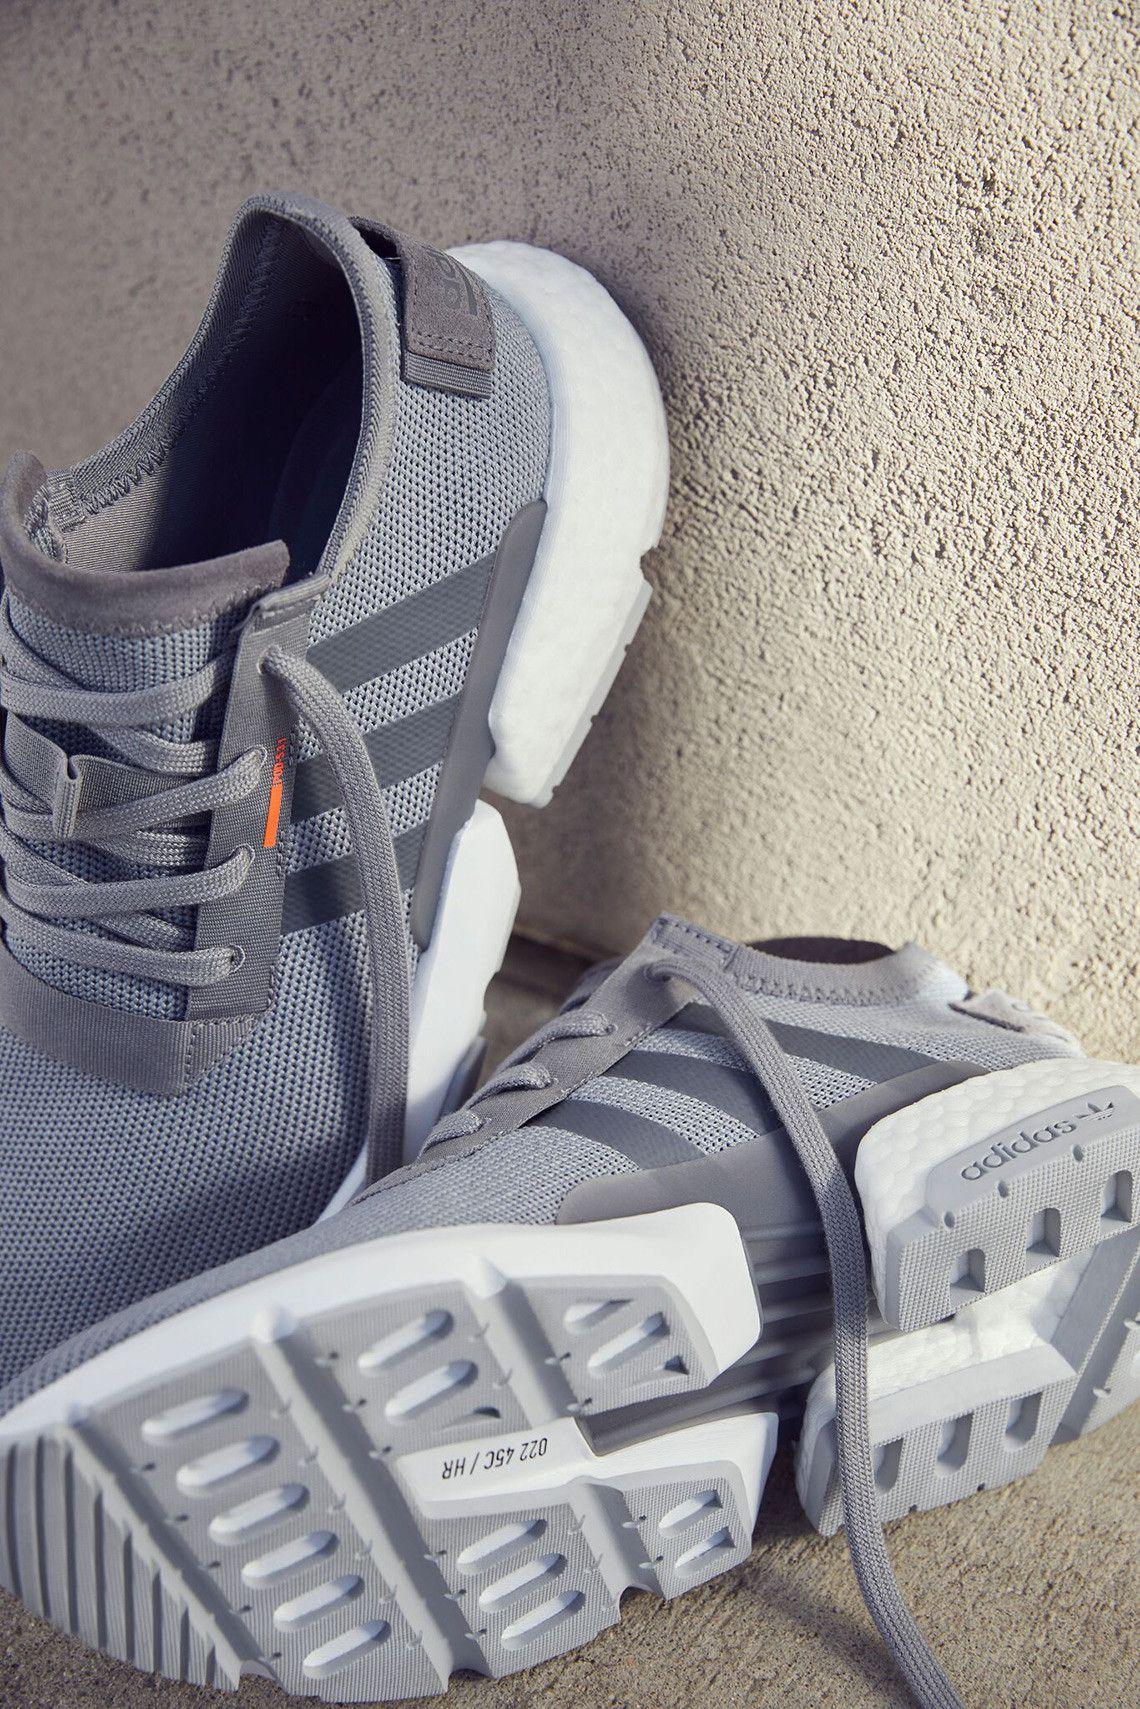 cheaper d2ef1 6ee58 adidas POD System b37365+b37469 Release Date  SneakerNews.com